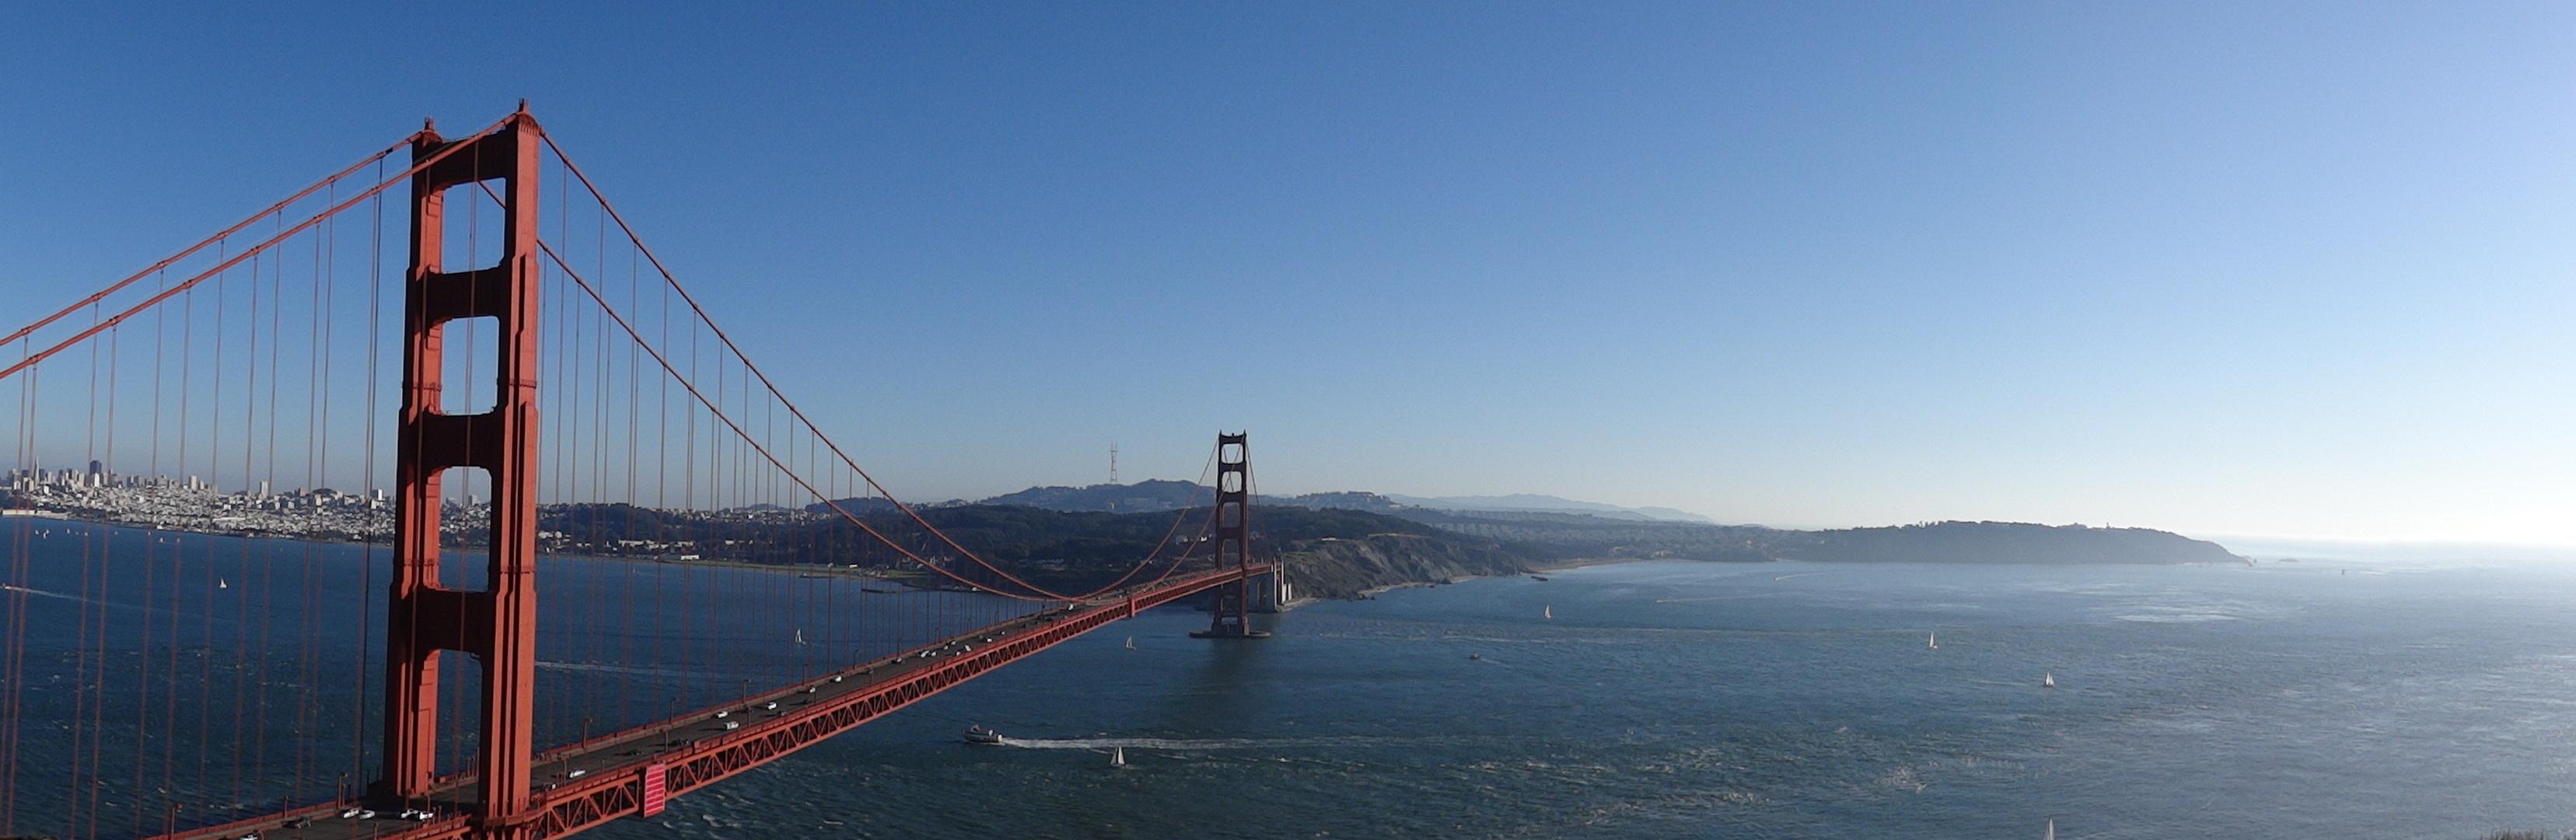 San Francisco Ocean Car Accident